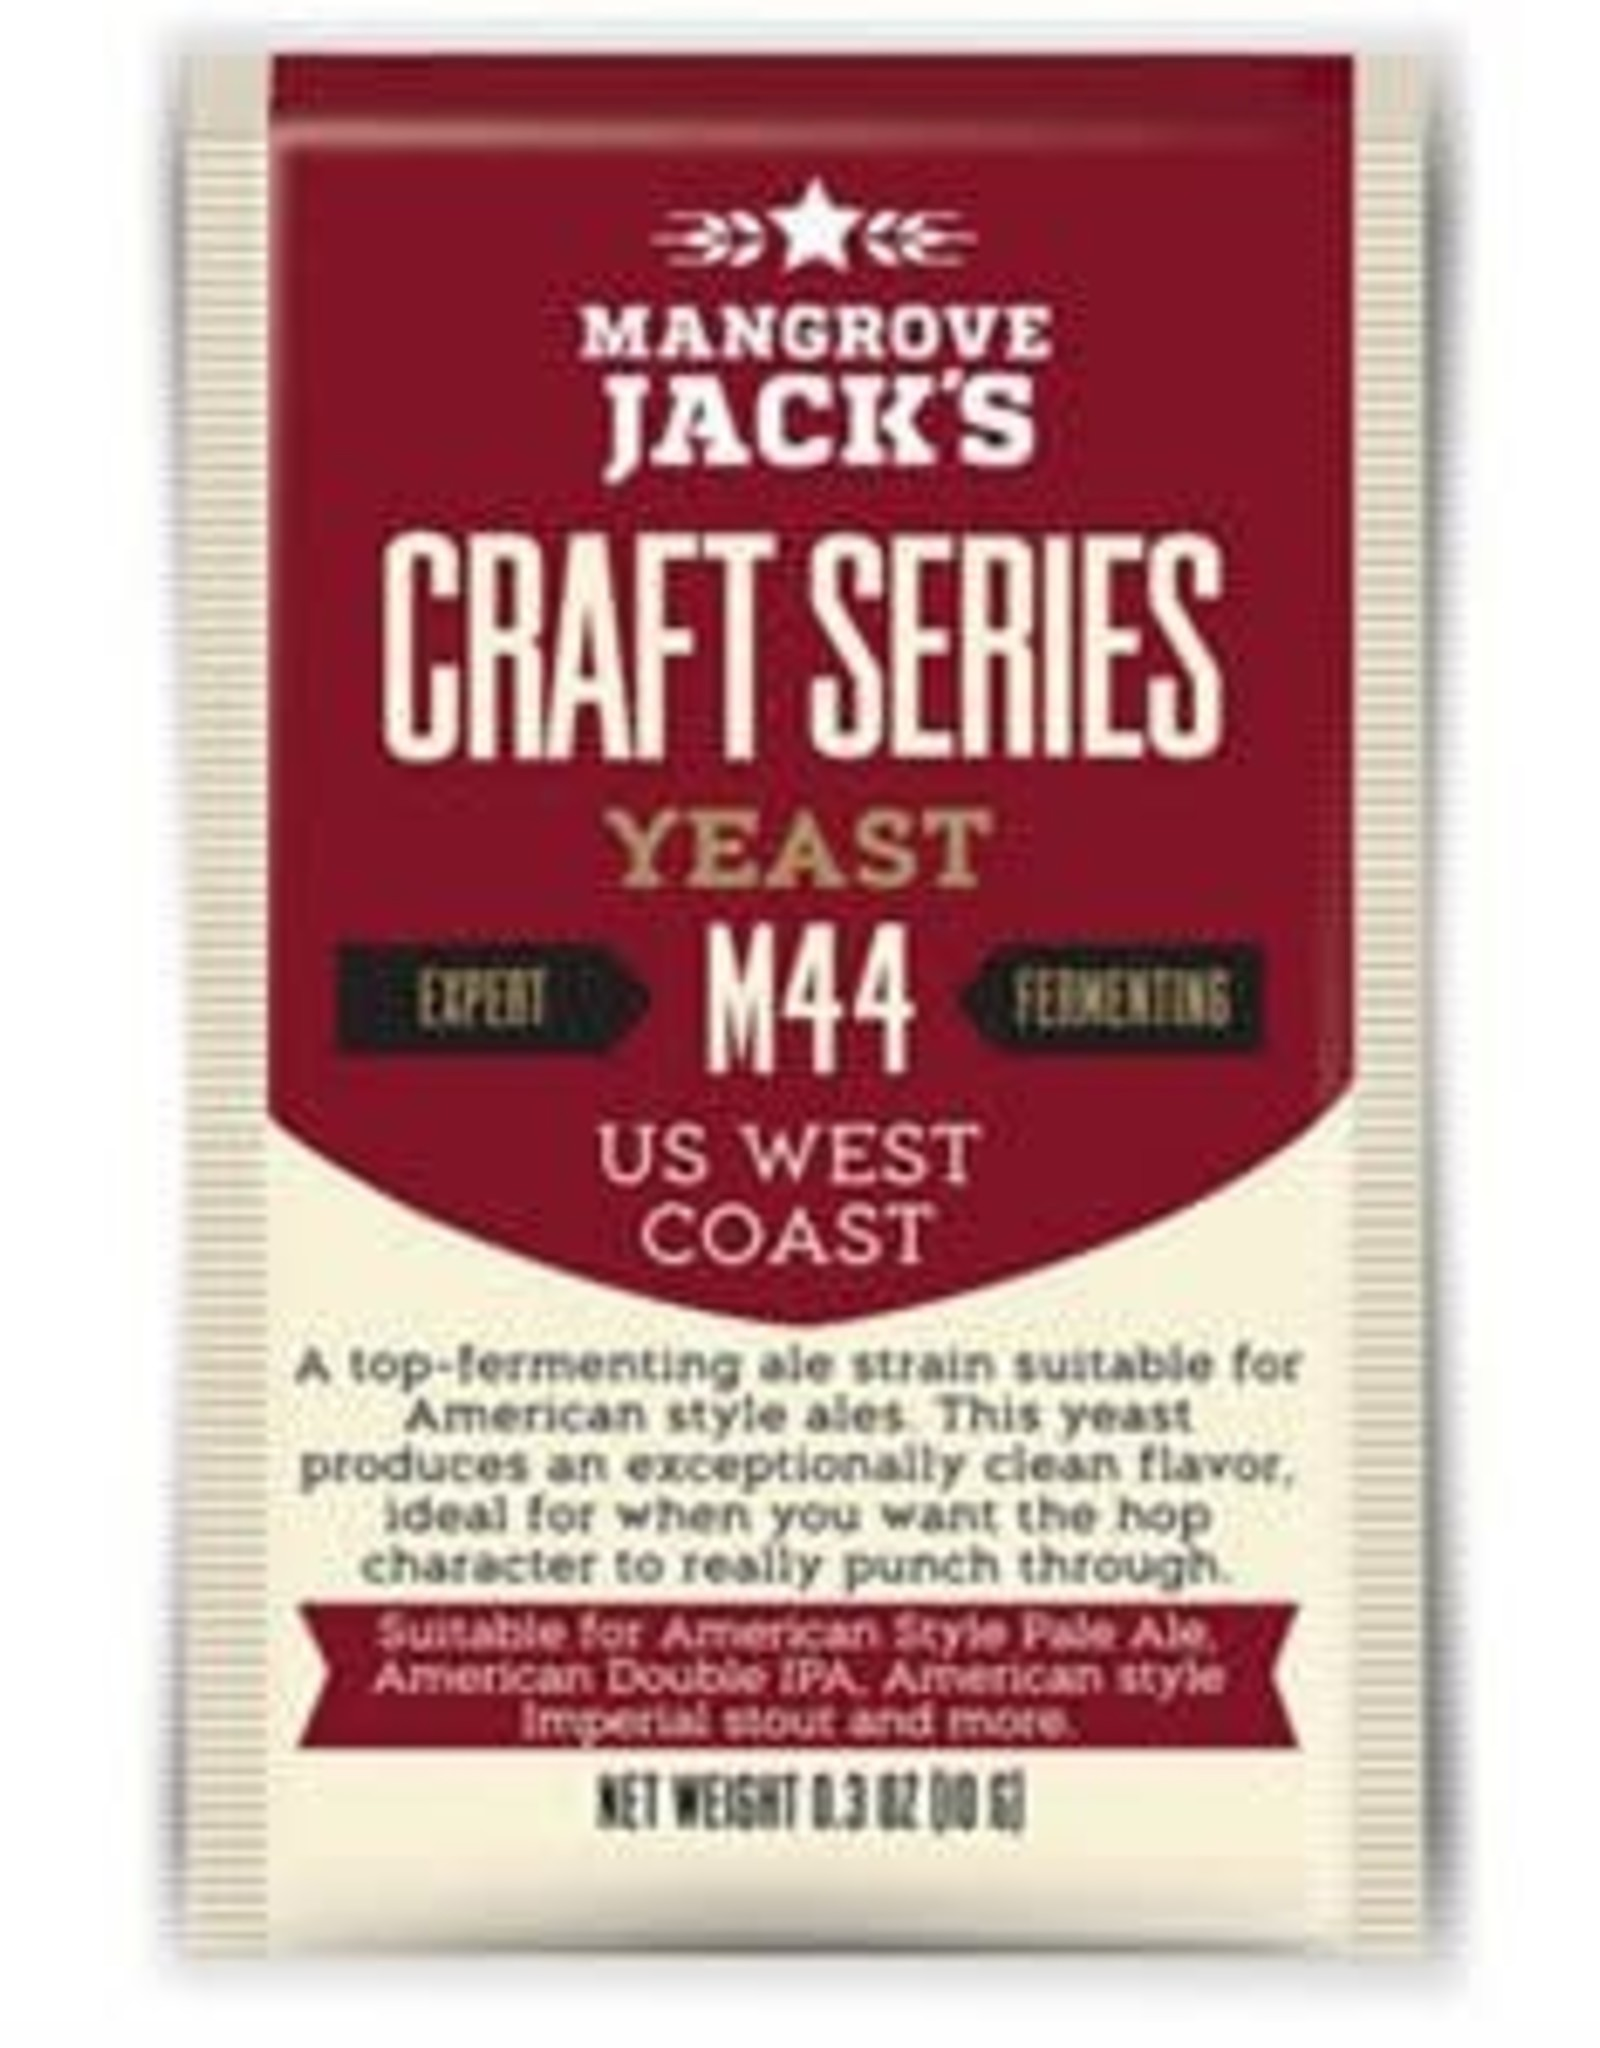 MANGROVE JACK'S U.S. WEST COAST M44